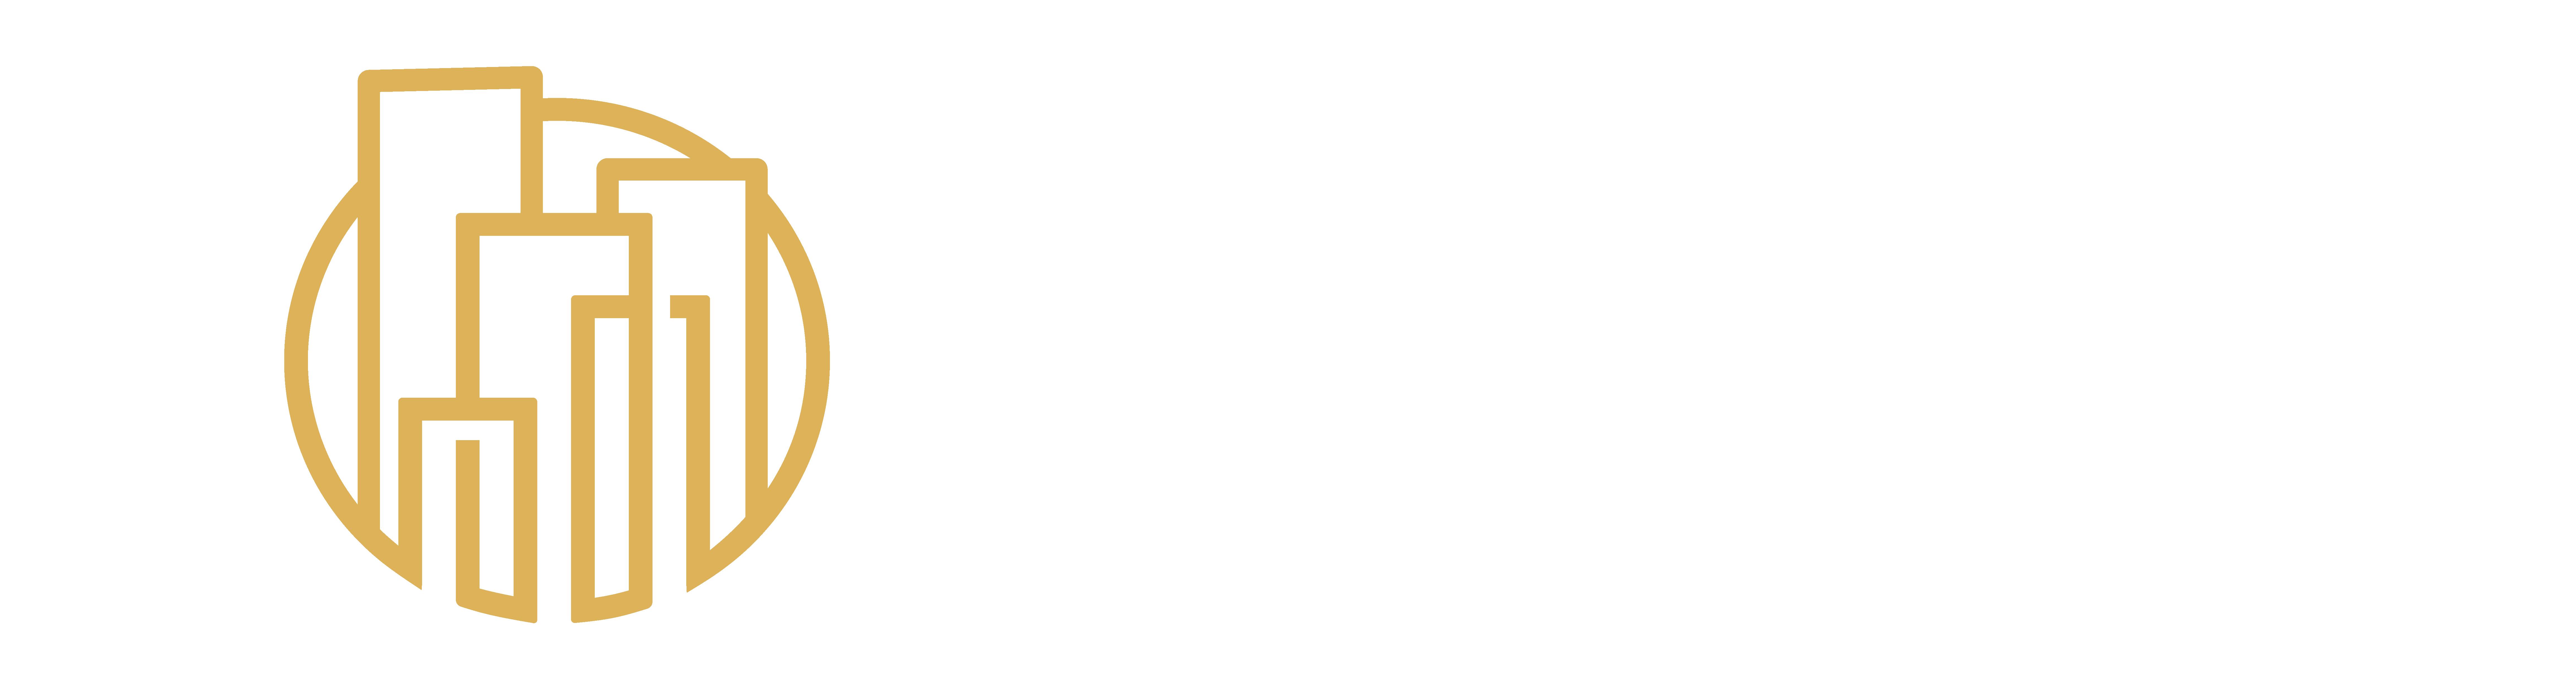 NEW WE LEND LOGOS-11-1